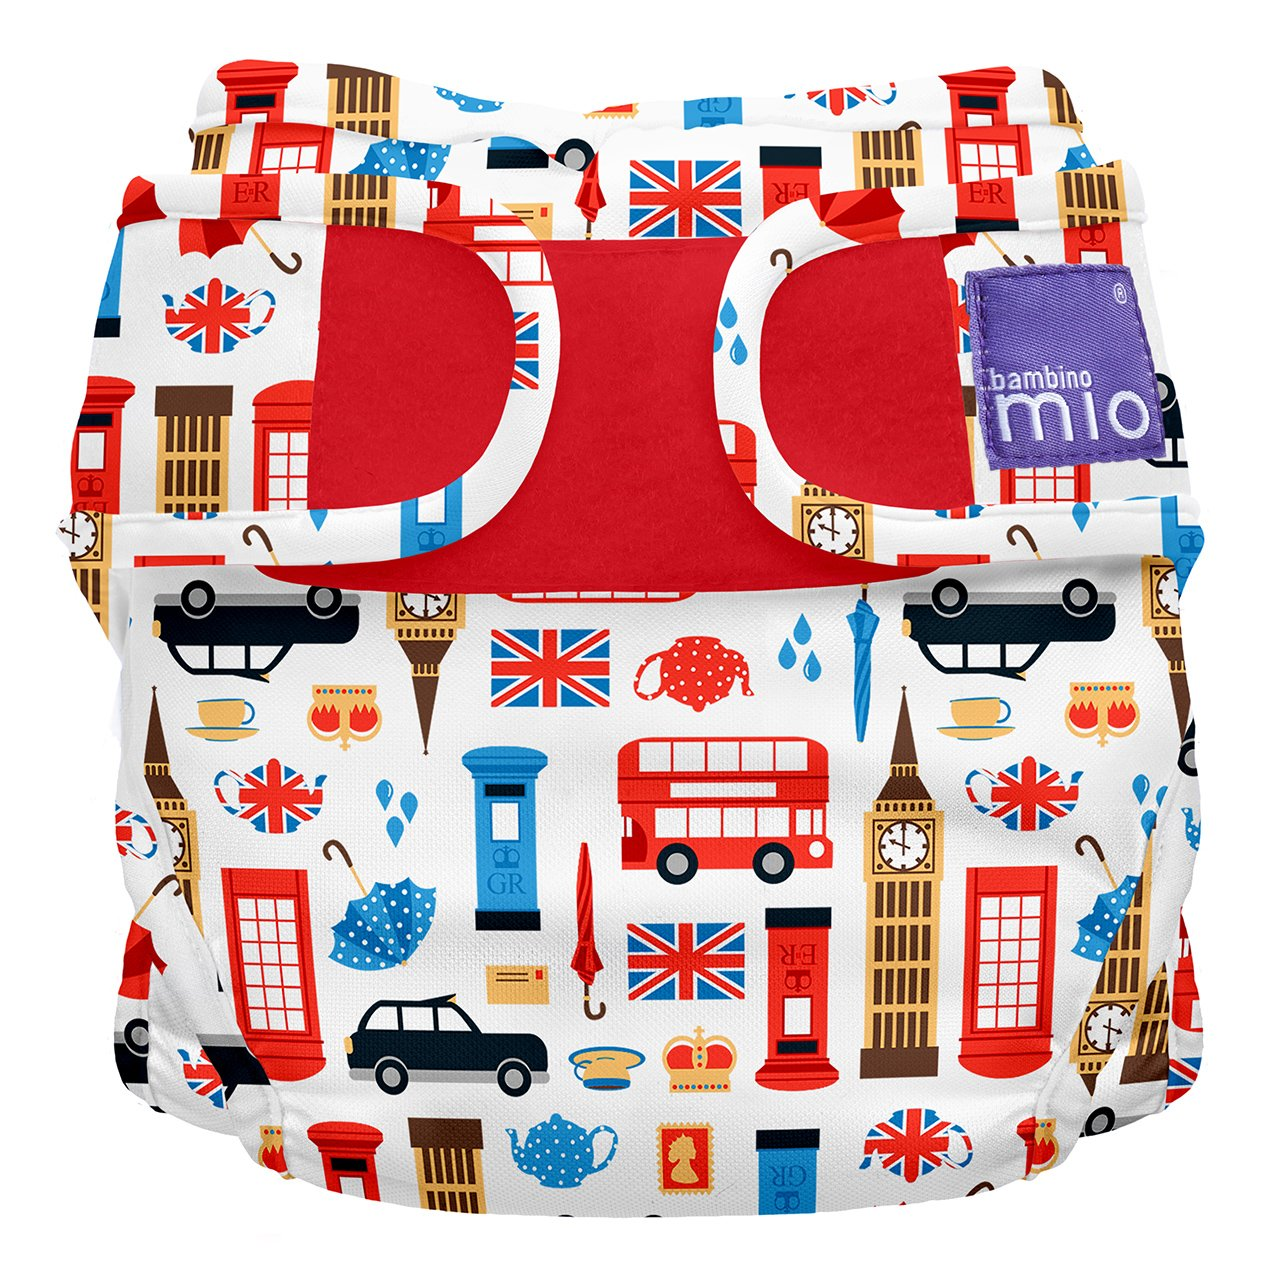 Bambino Mio Miosoft Two-Piece Diaper, Great Britain, Size 2